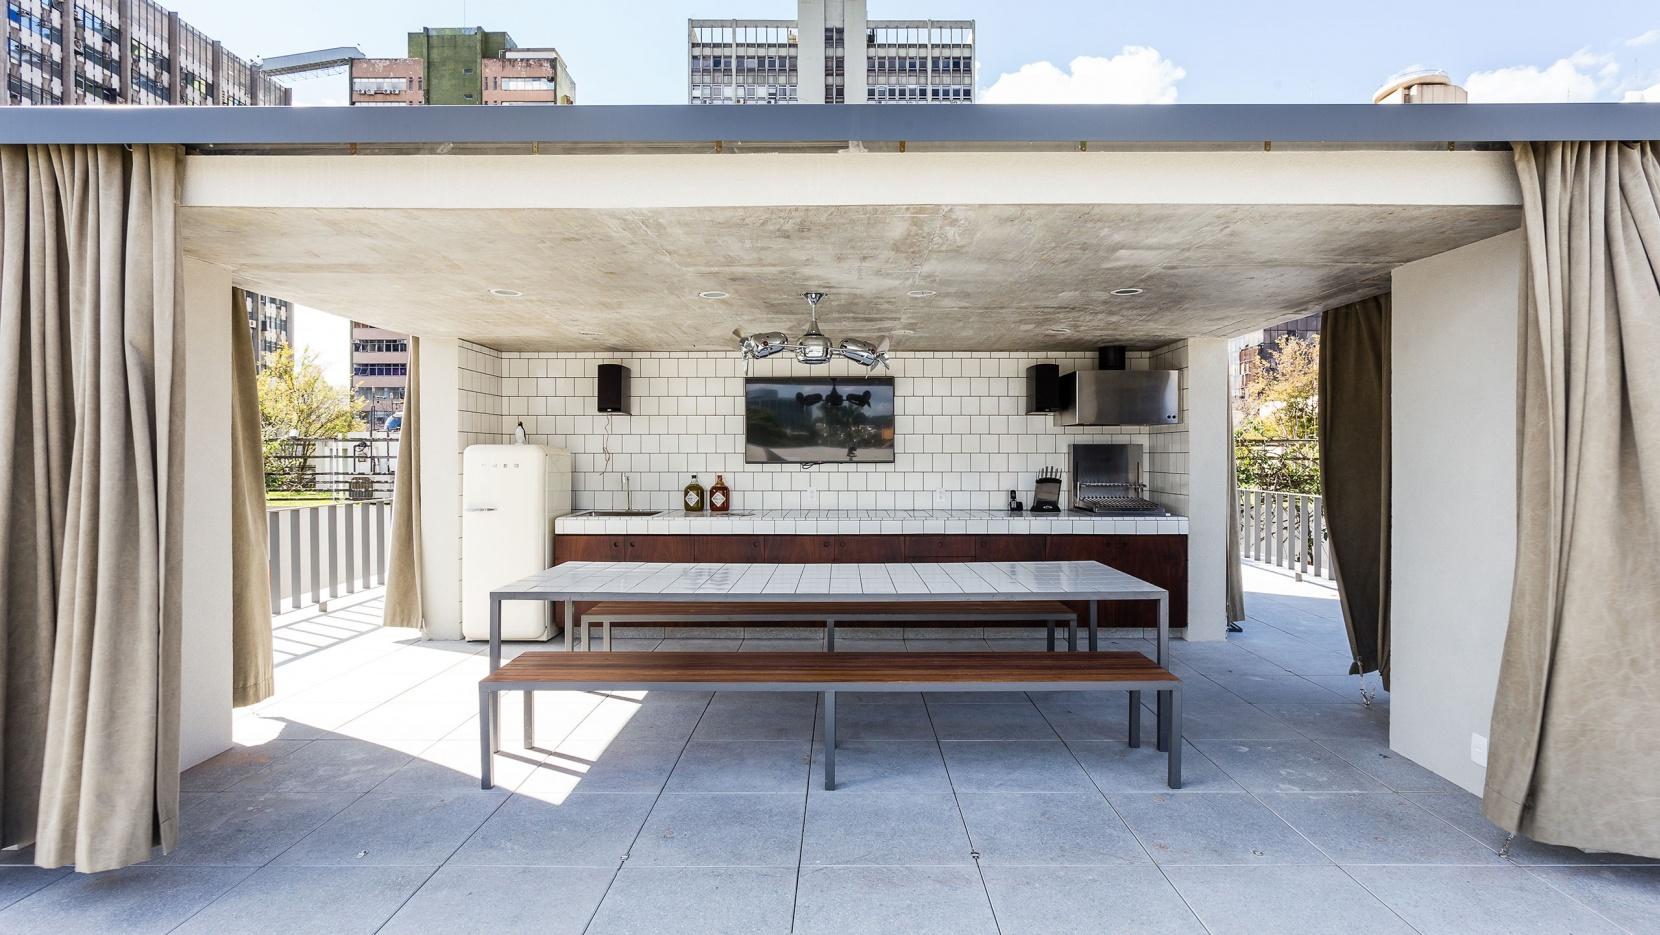 casa lara by felipe hess1 Lara House in Brasil by Felipe Hess